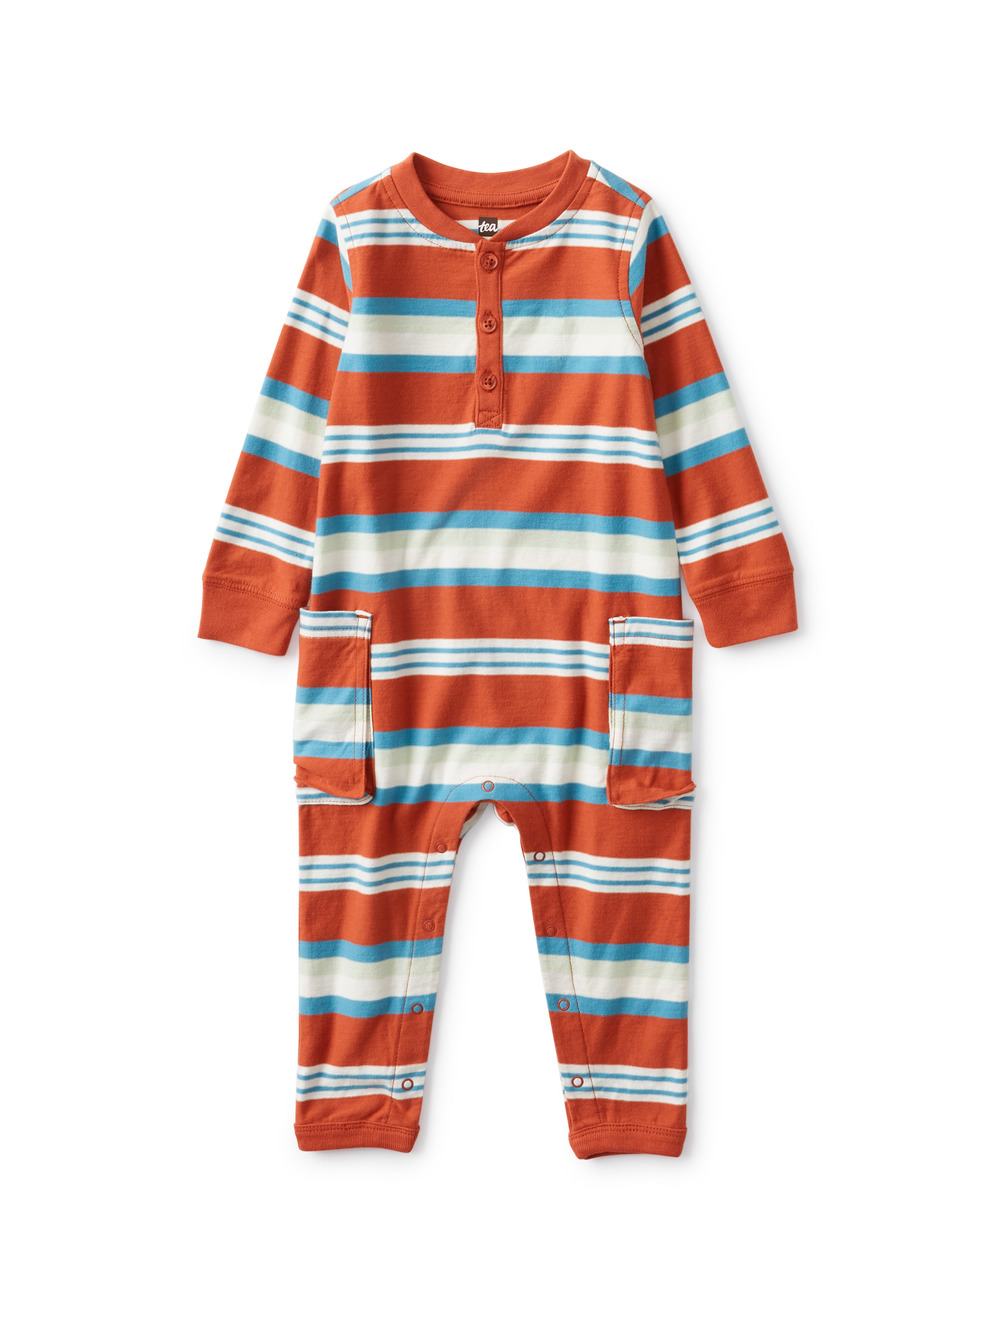 Cargo Pocket Baby Romper